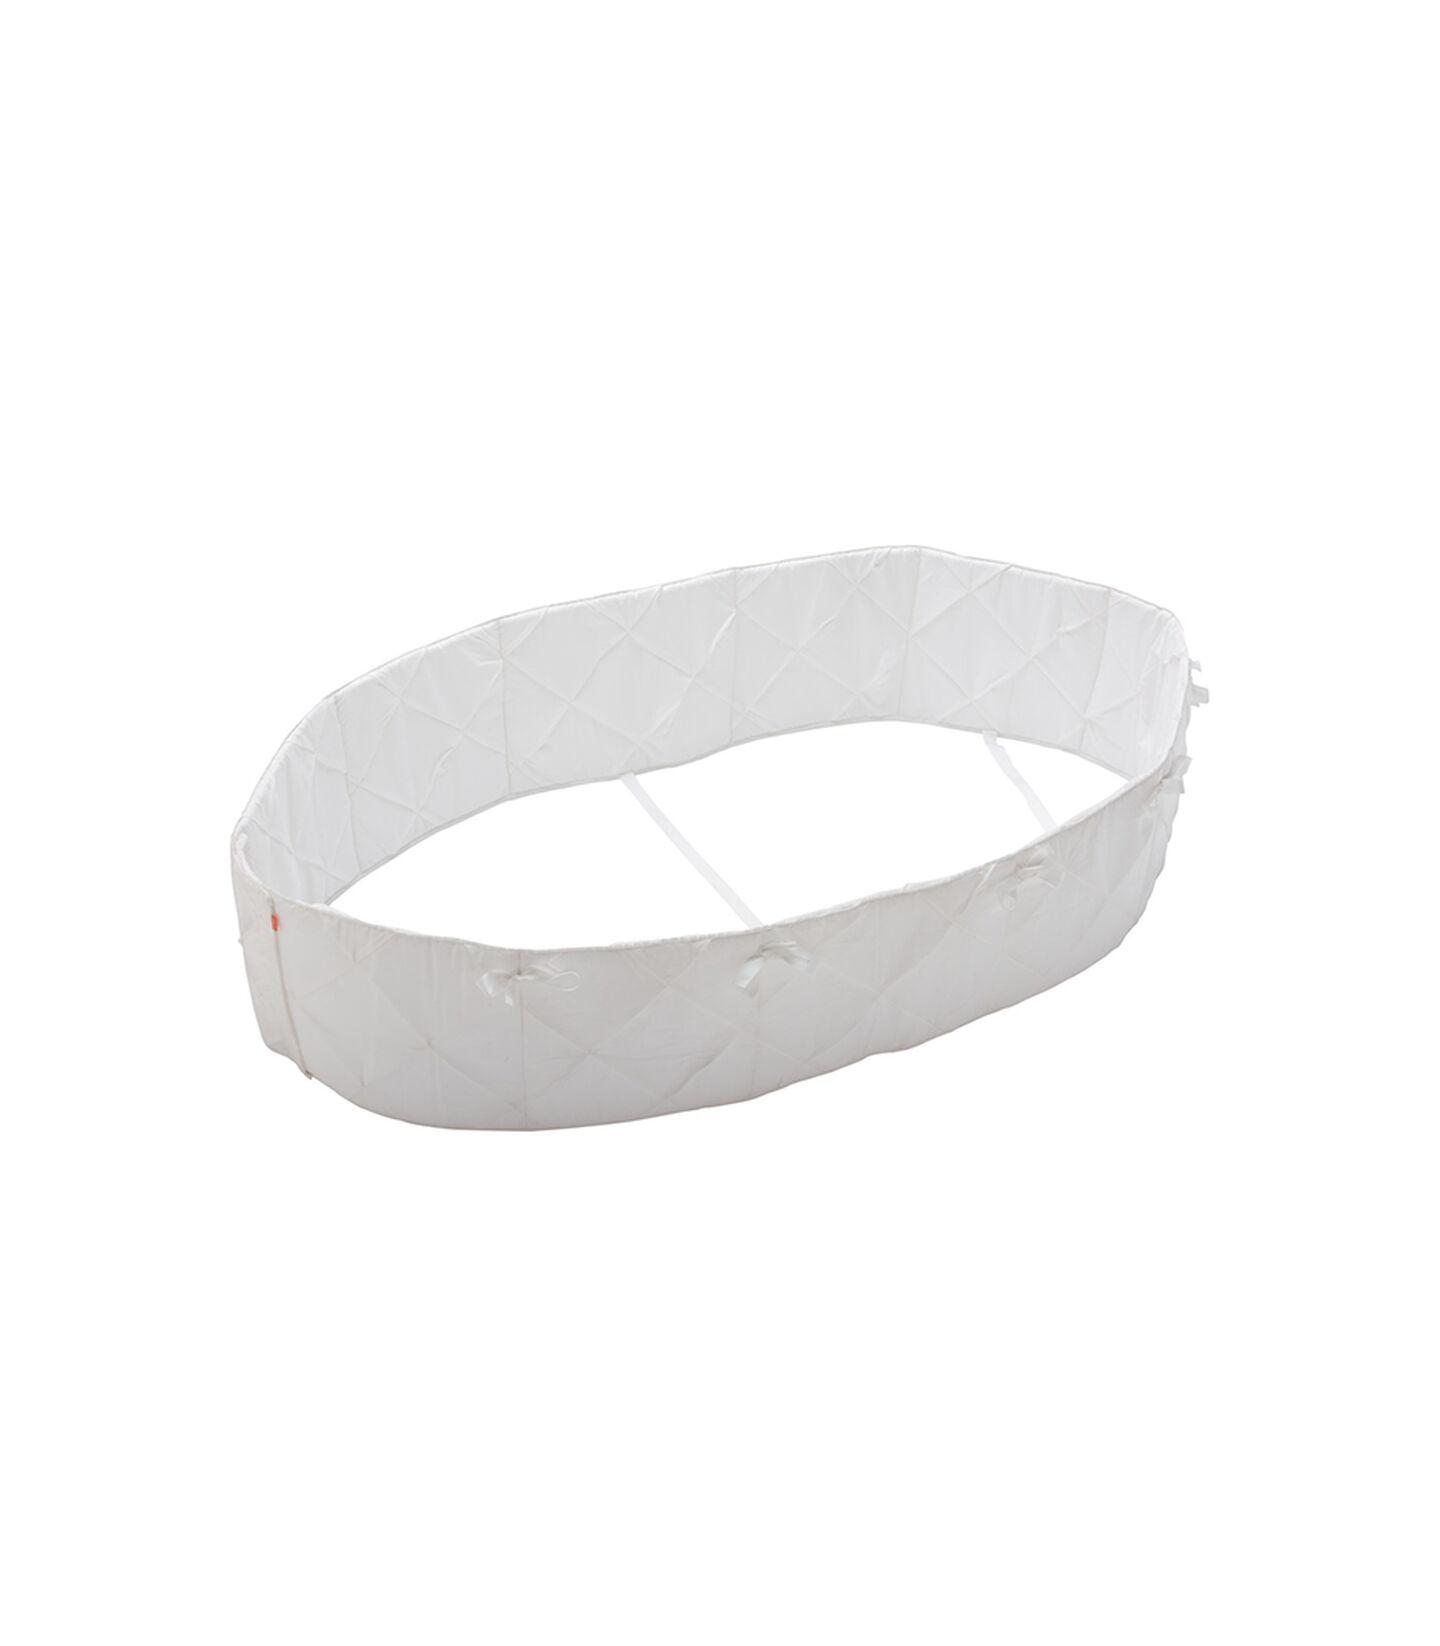 Stokke Sleepi Bed Bumper, Classic White